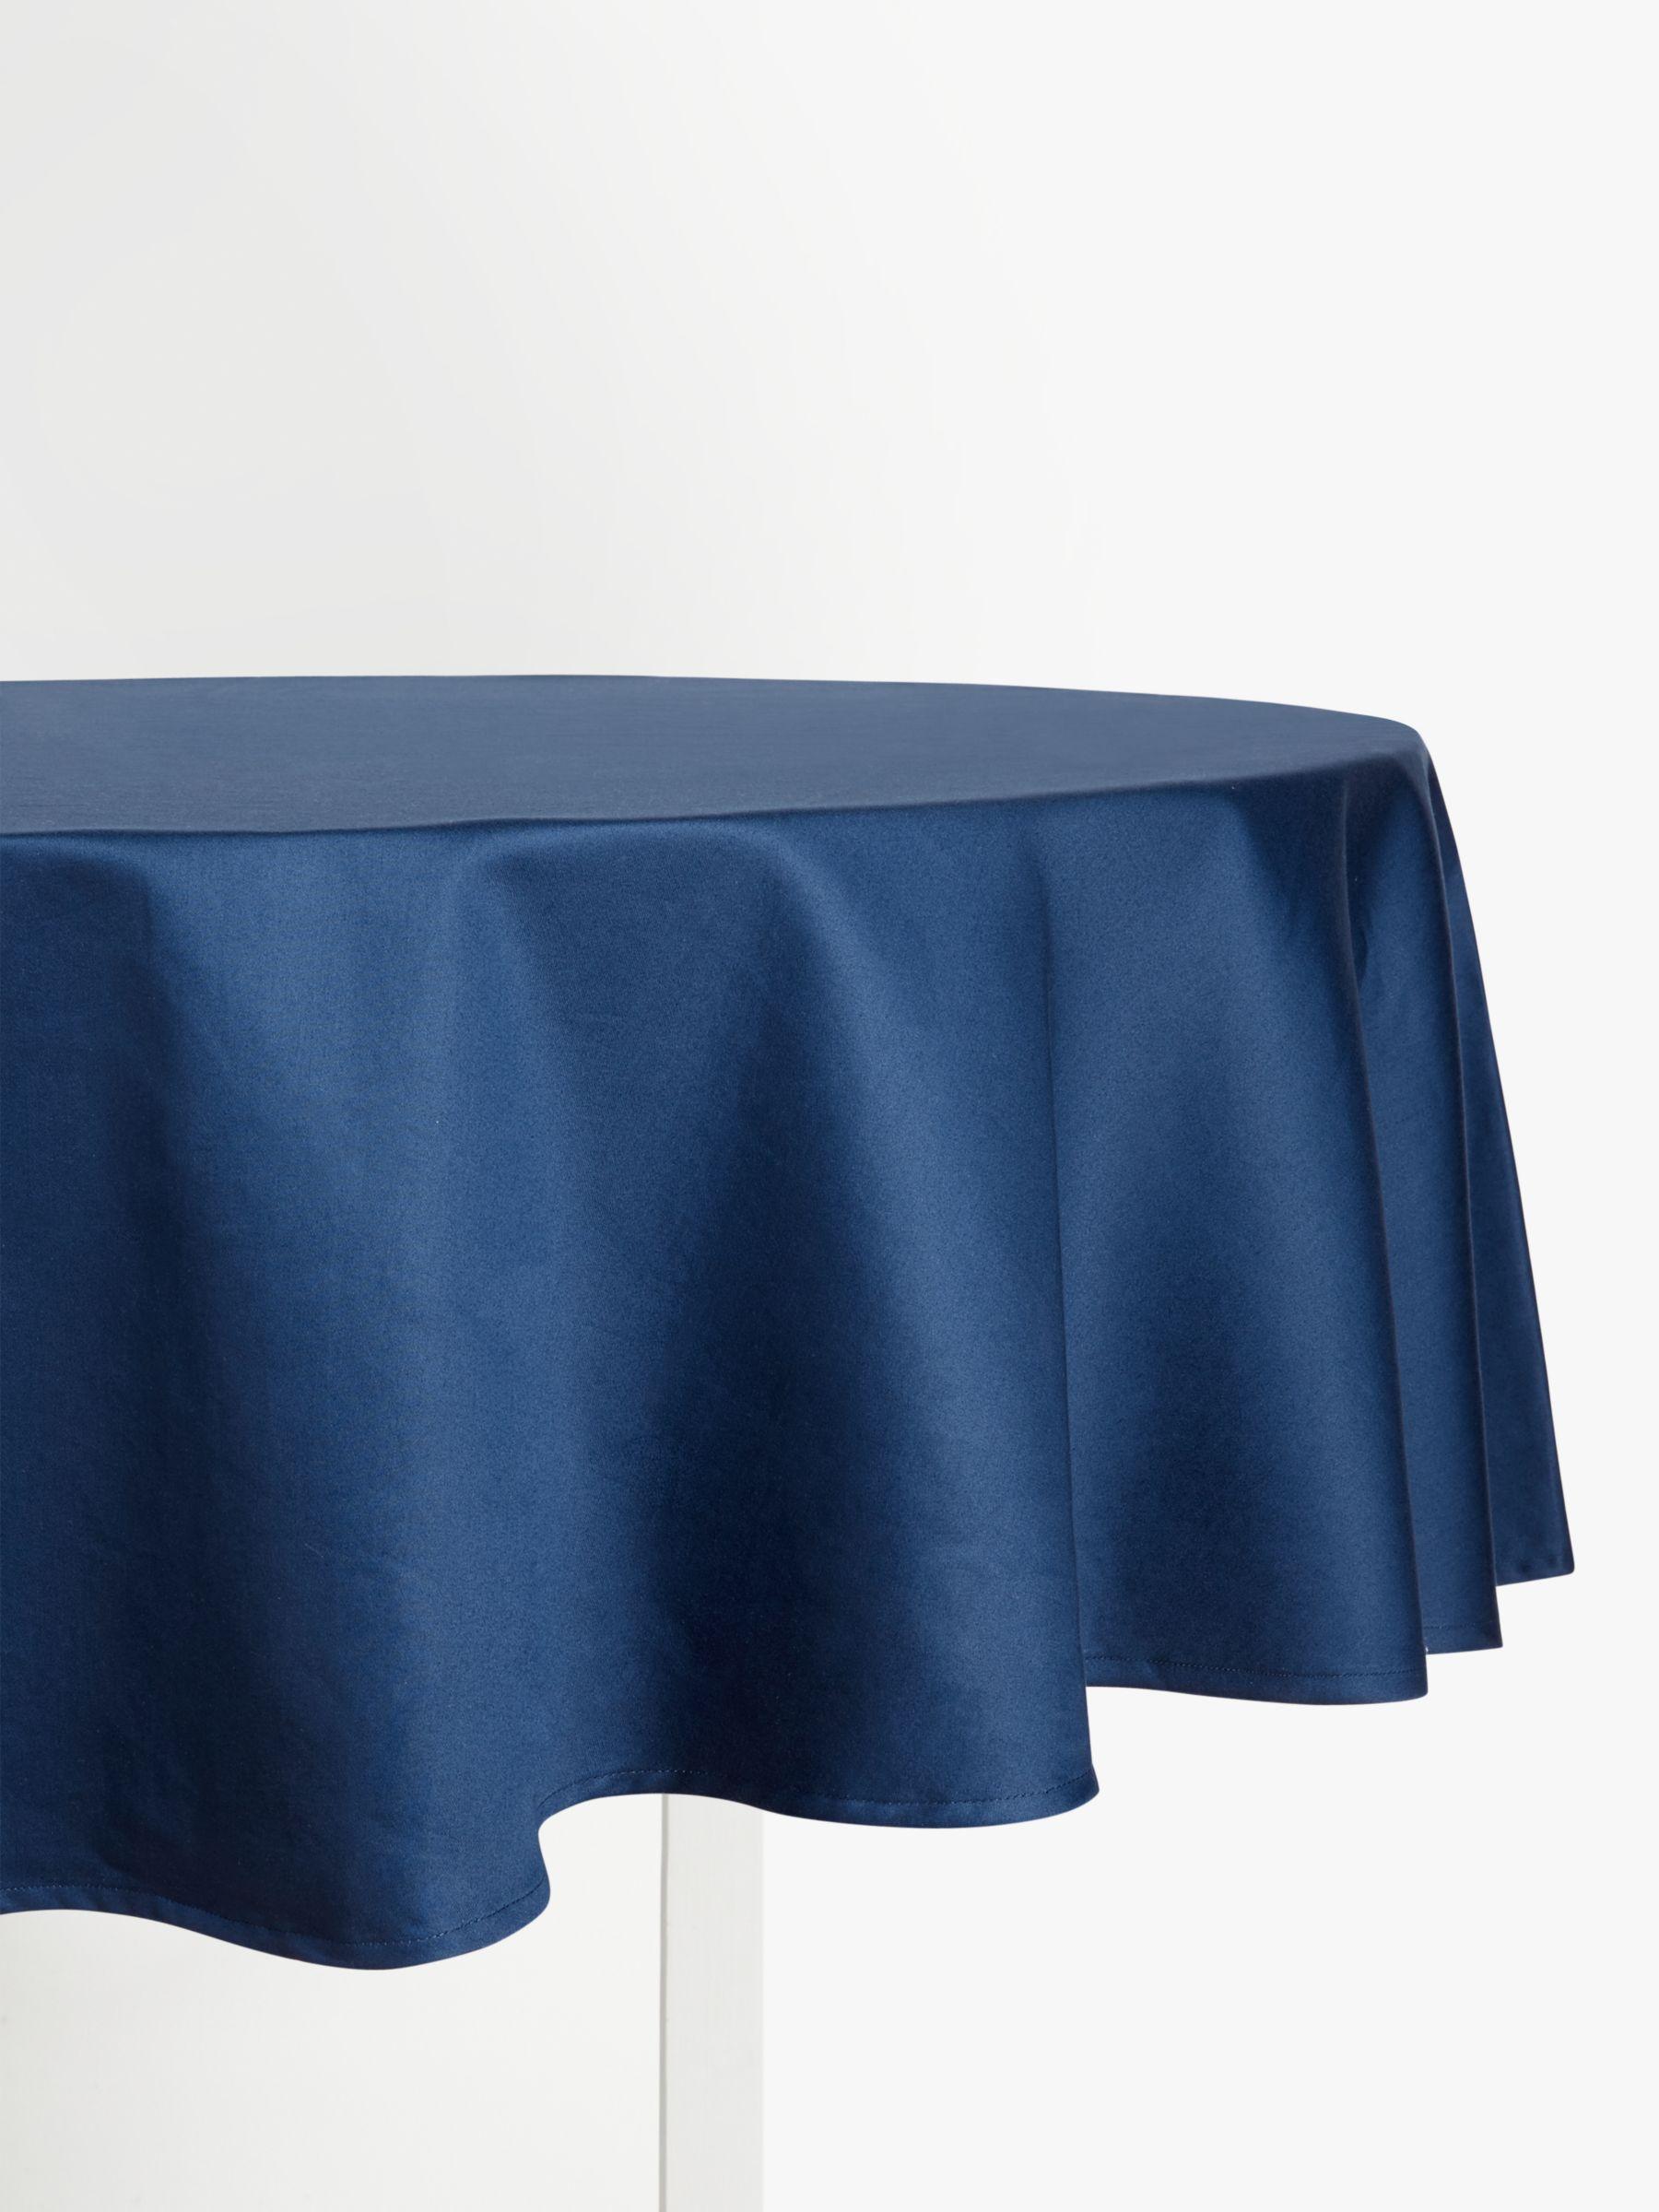 John Lewis Tablecloths Tablecloths John Lewis Partners